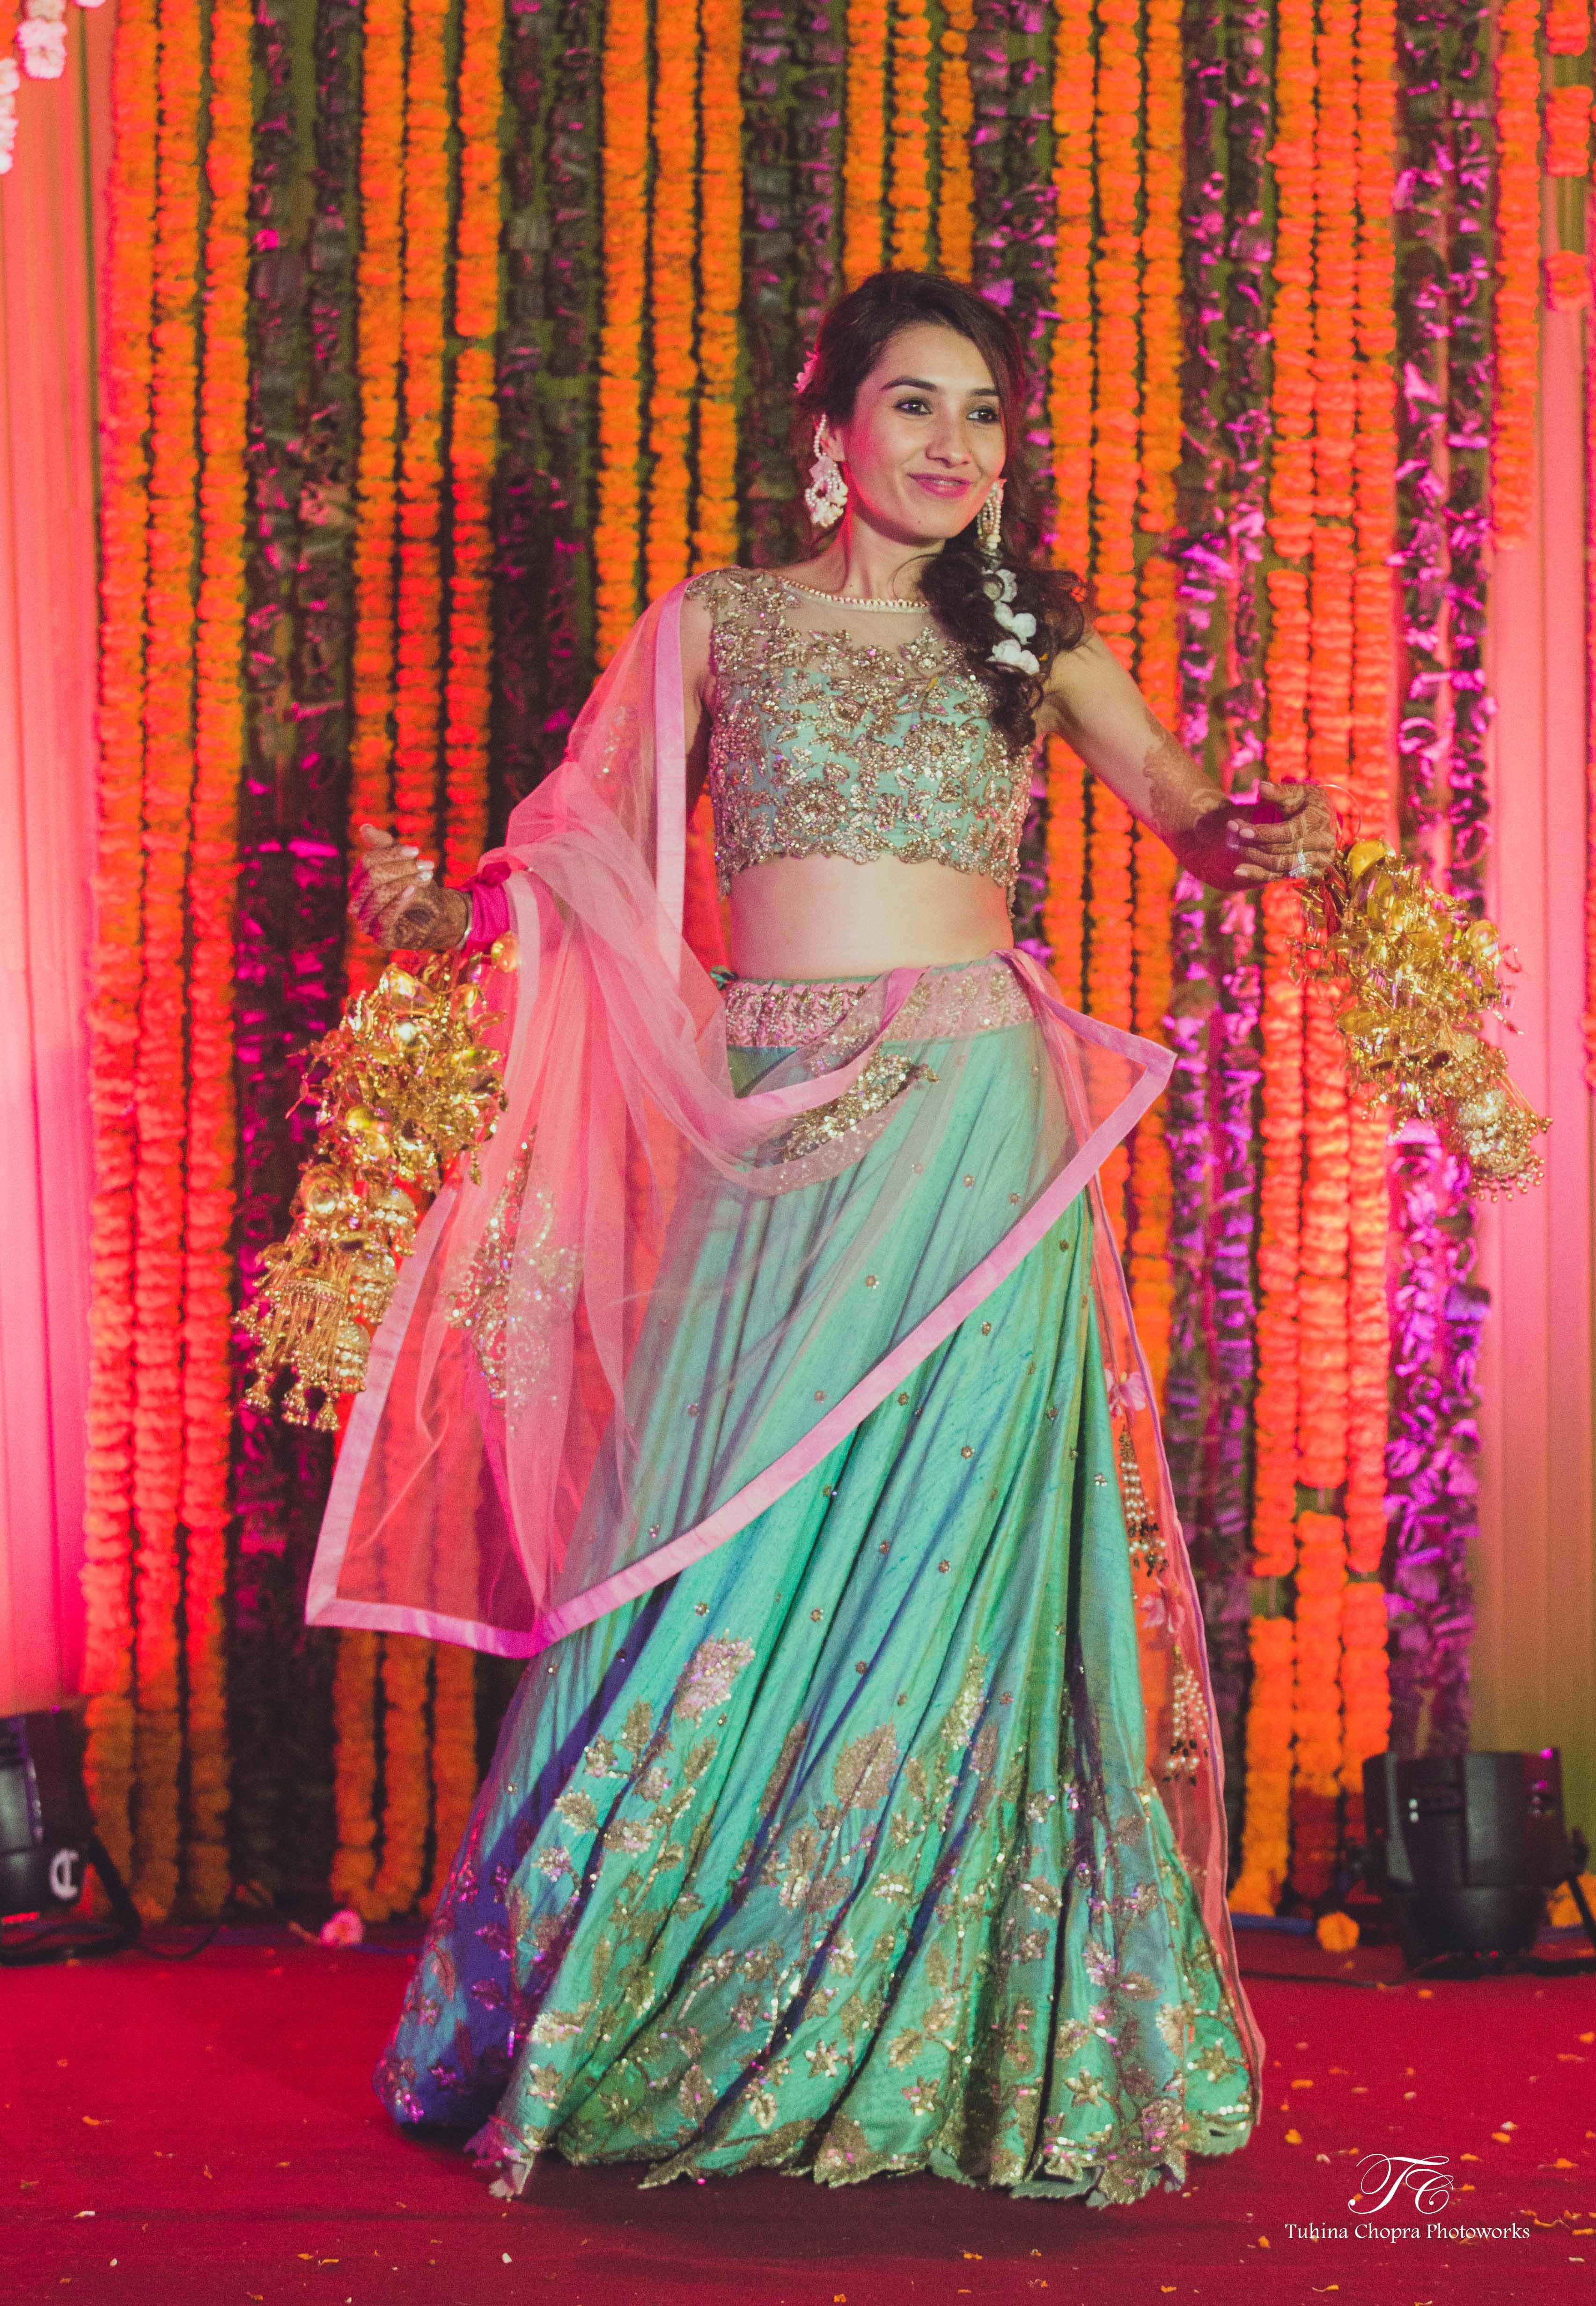 bride and sangeet:tuhina chopra photoworks